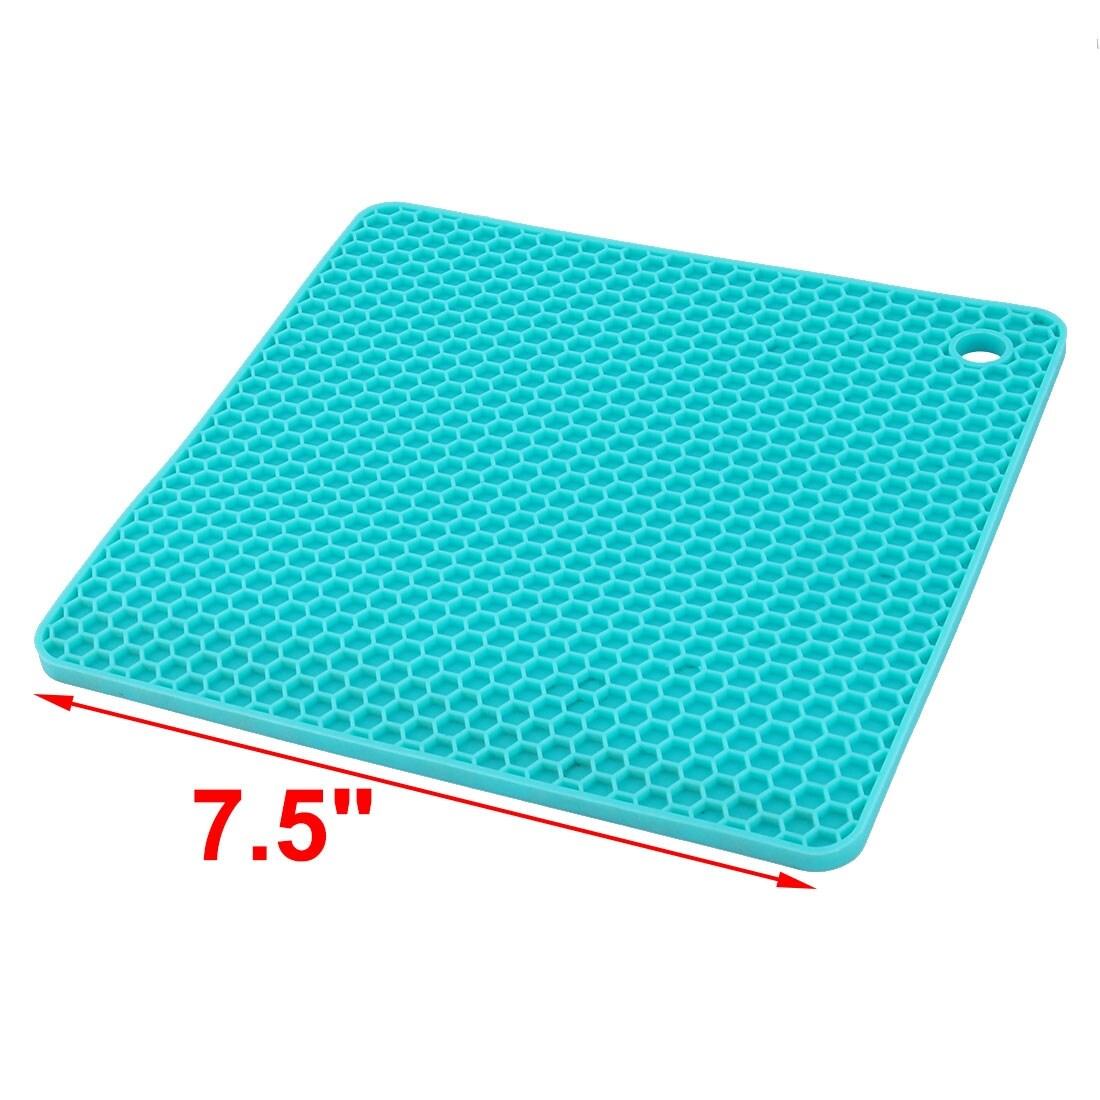 Shop Kitchen Silicone Honeycomb Design Bowl Plate Heat Resistant Mat ...